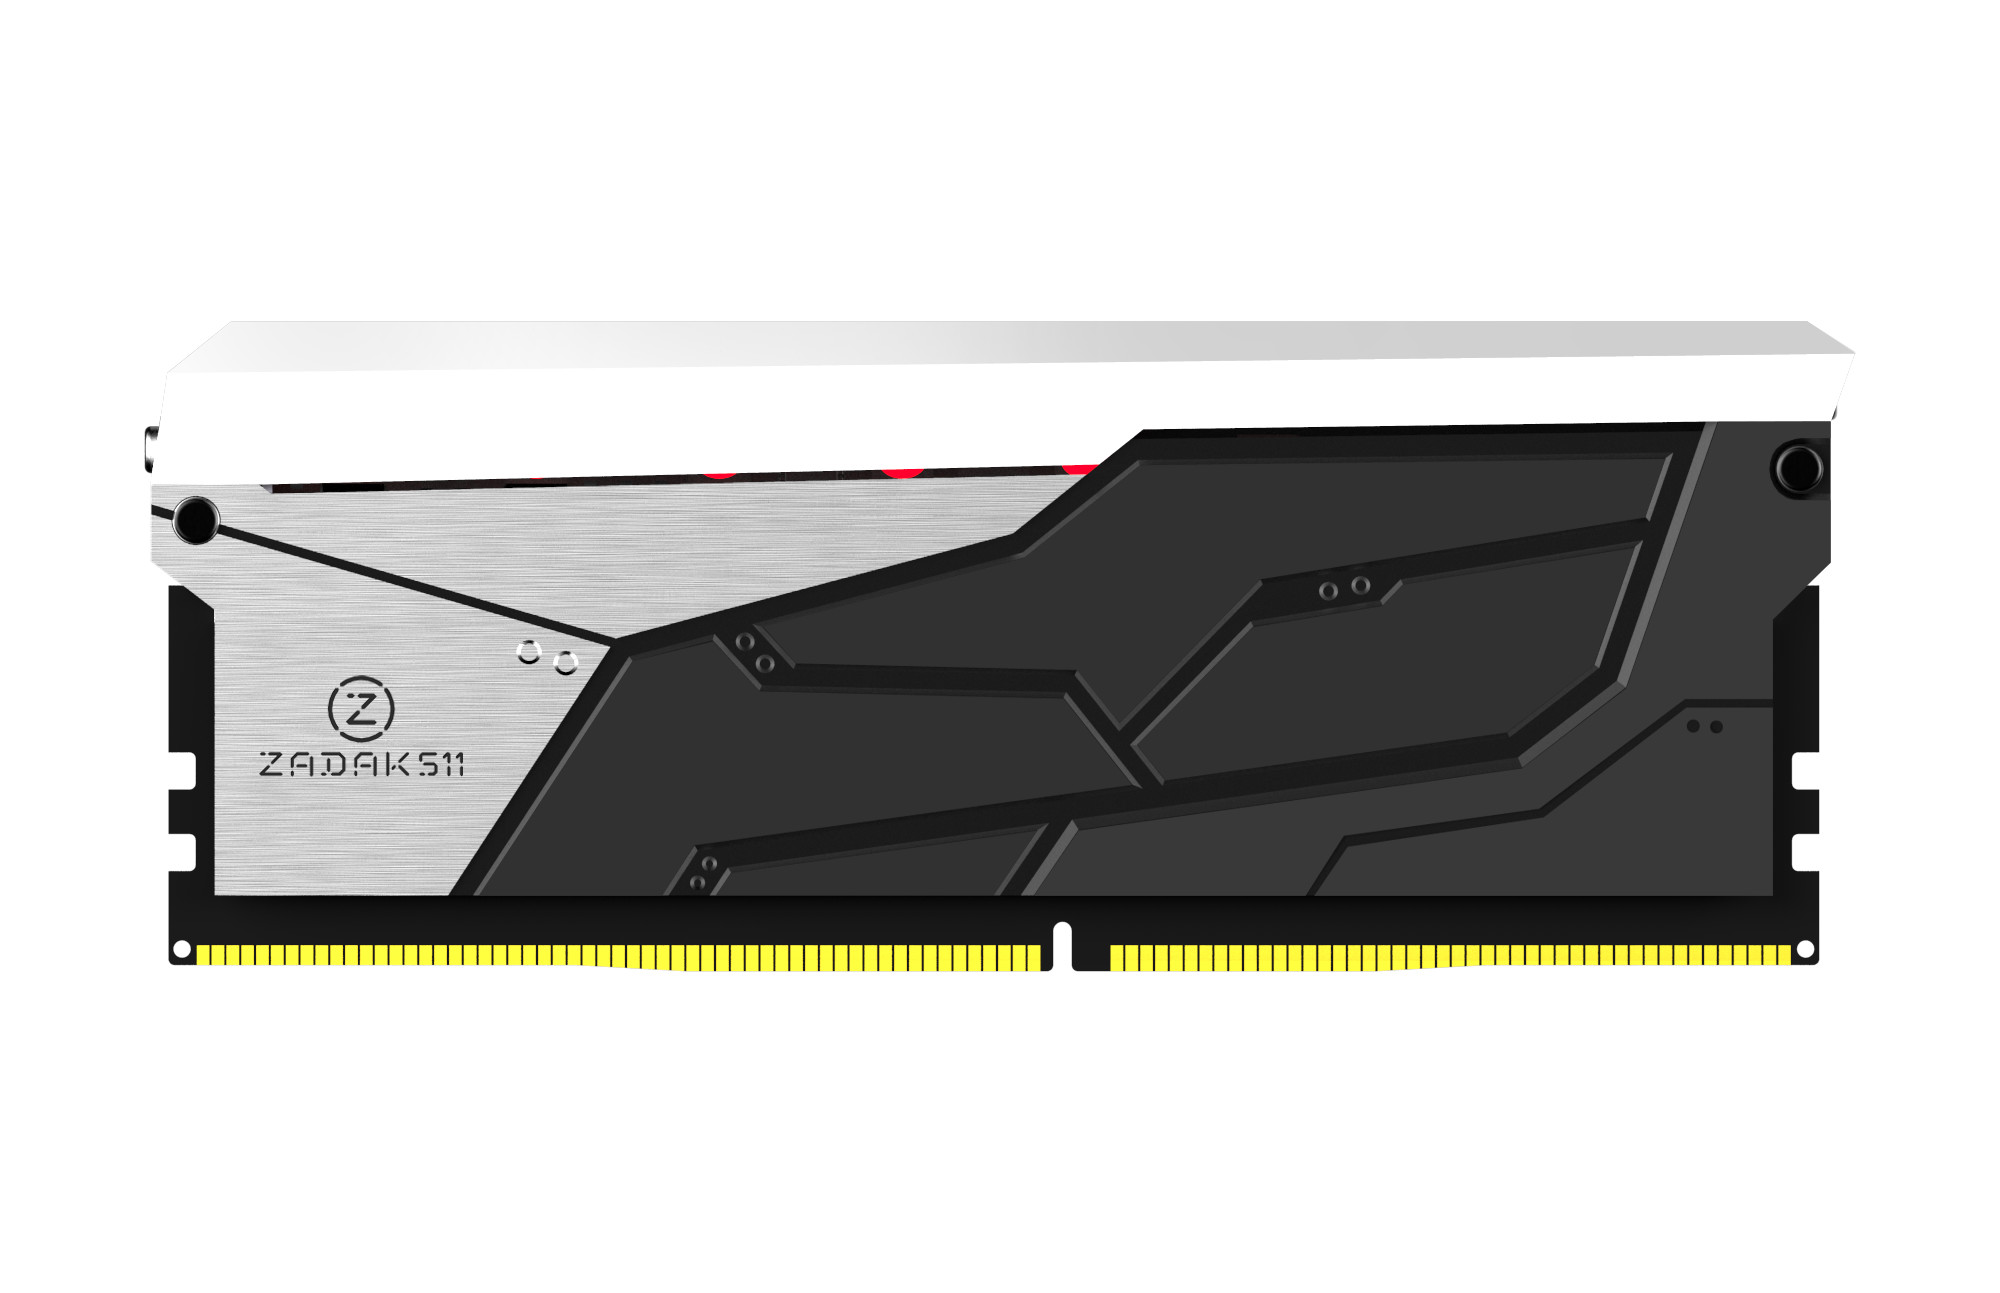 ZADAK511 Announces the Shield RGB DDR4 Intel 200 Series Chipset